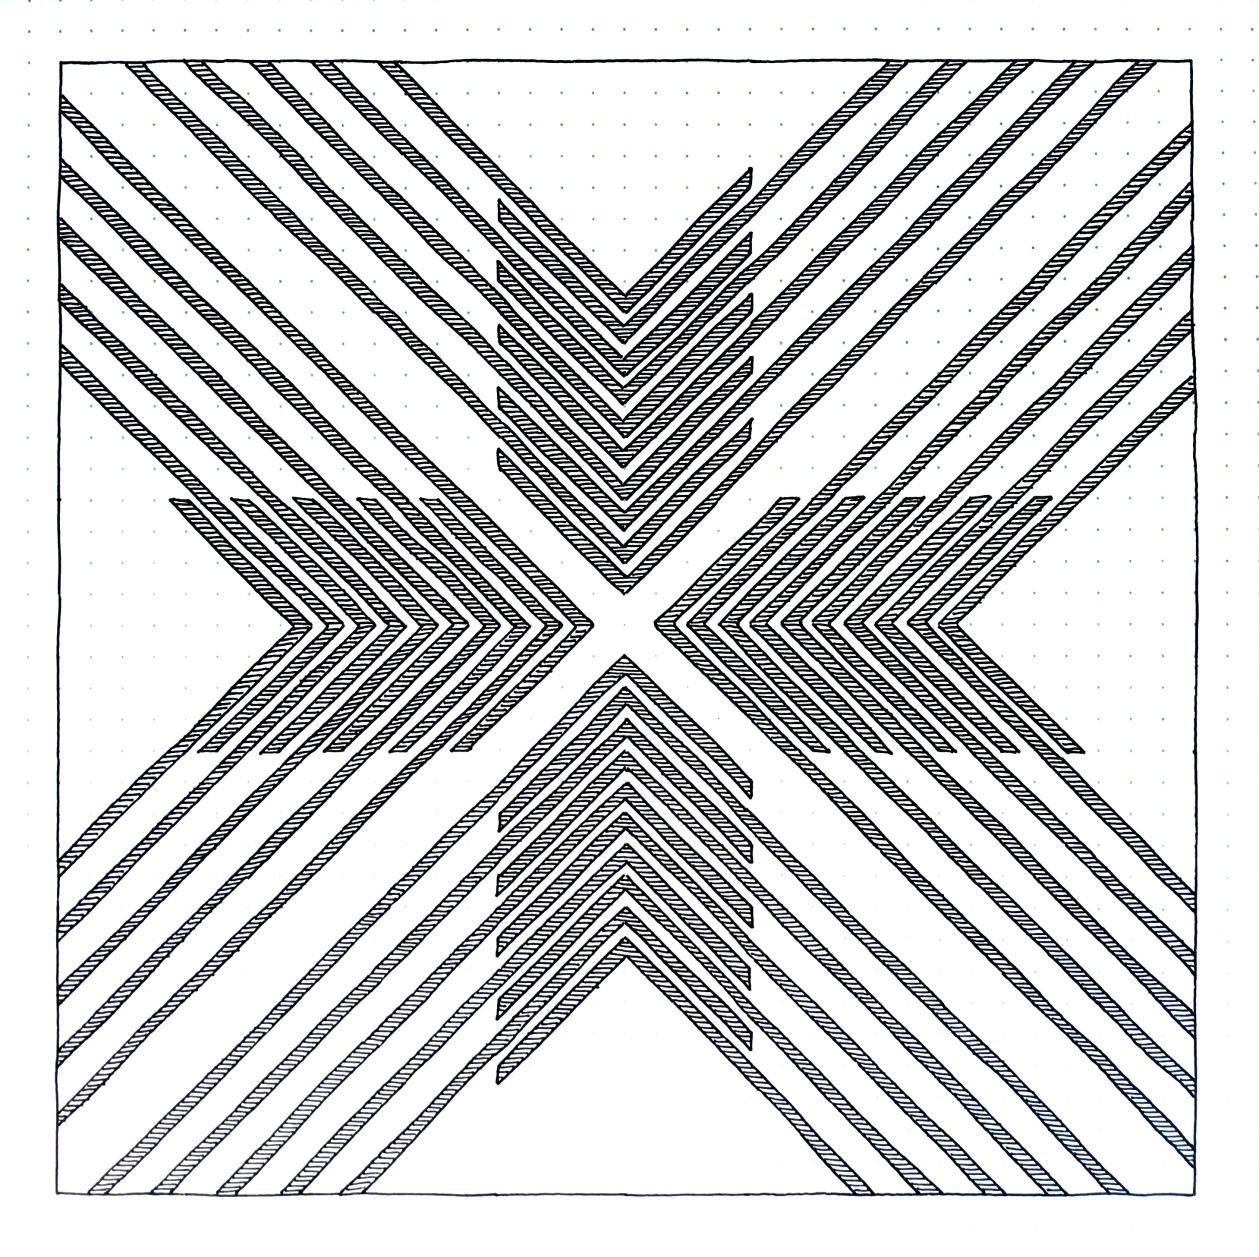 Geometriquilt: Sunday sketch #152